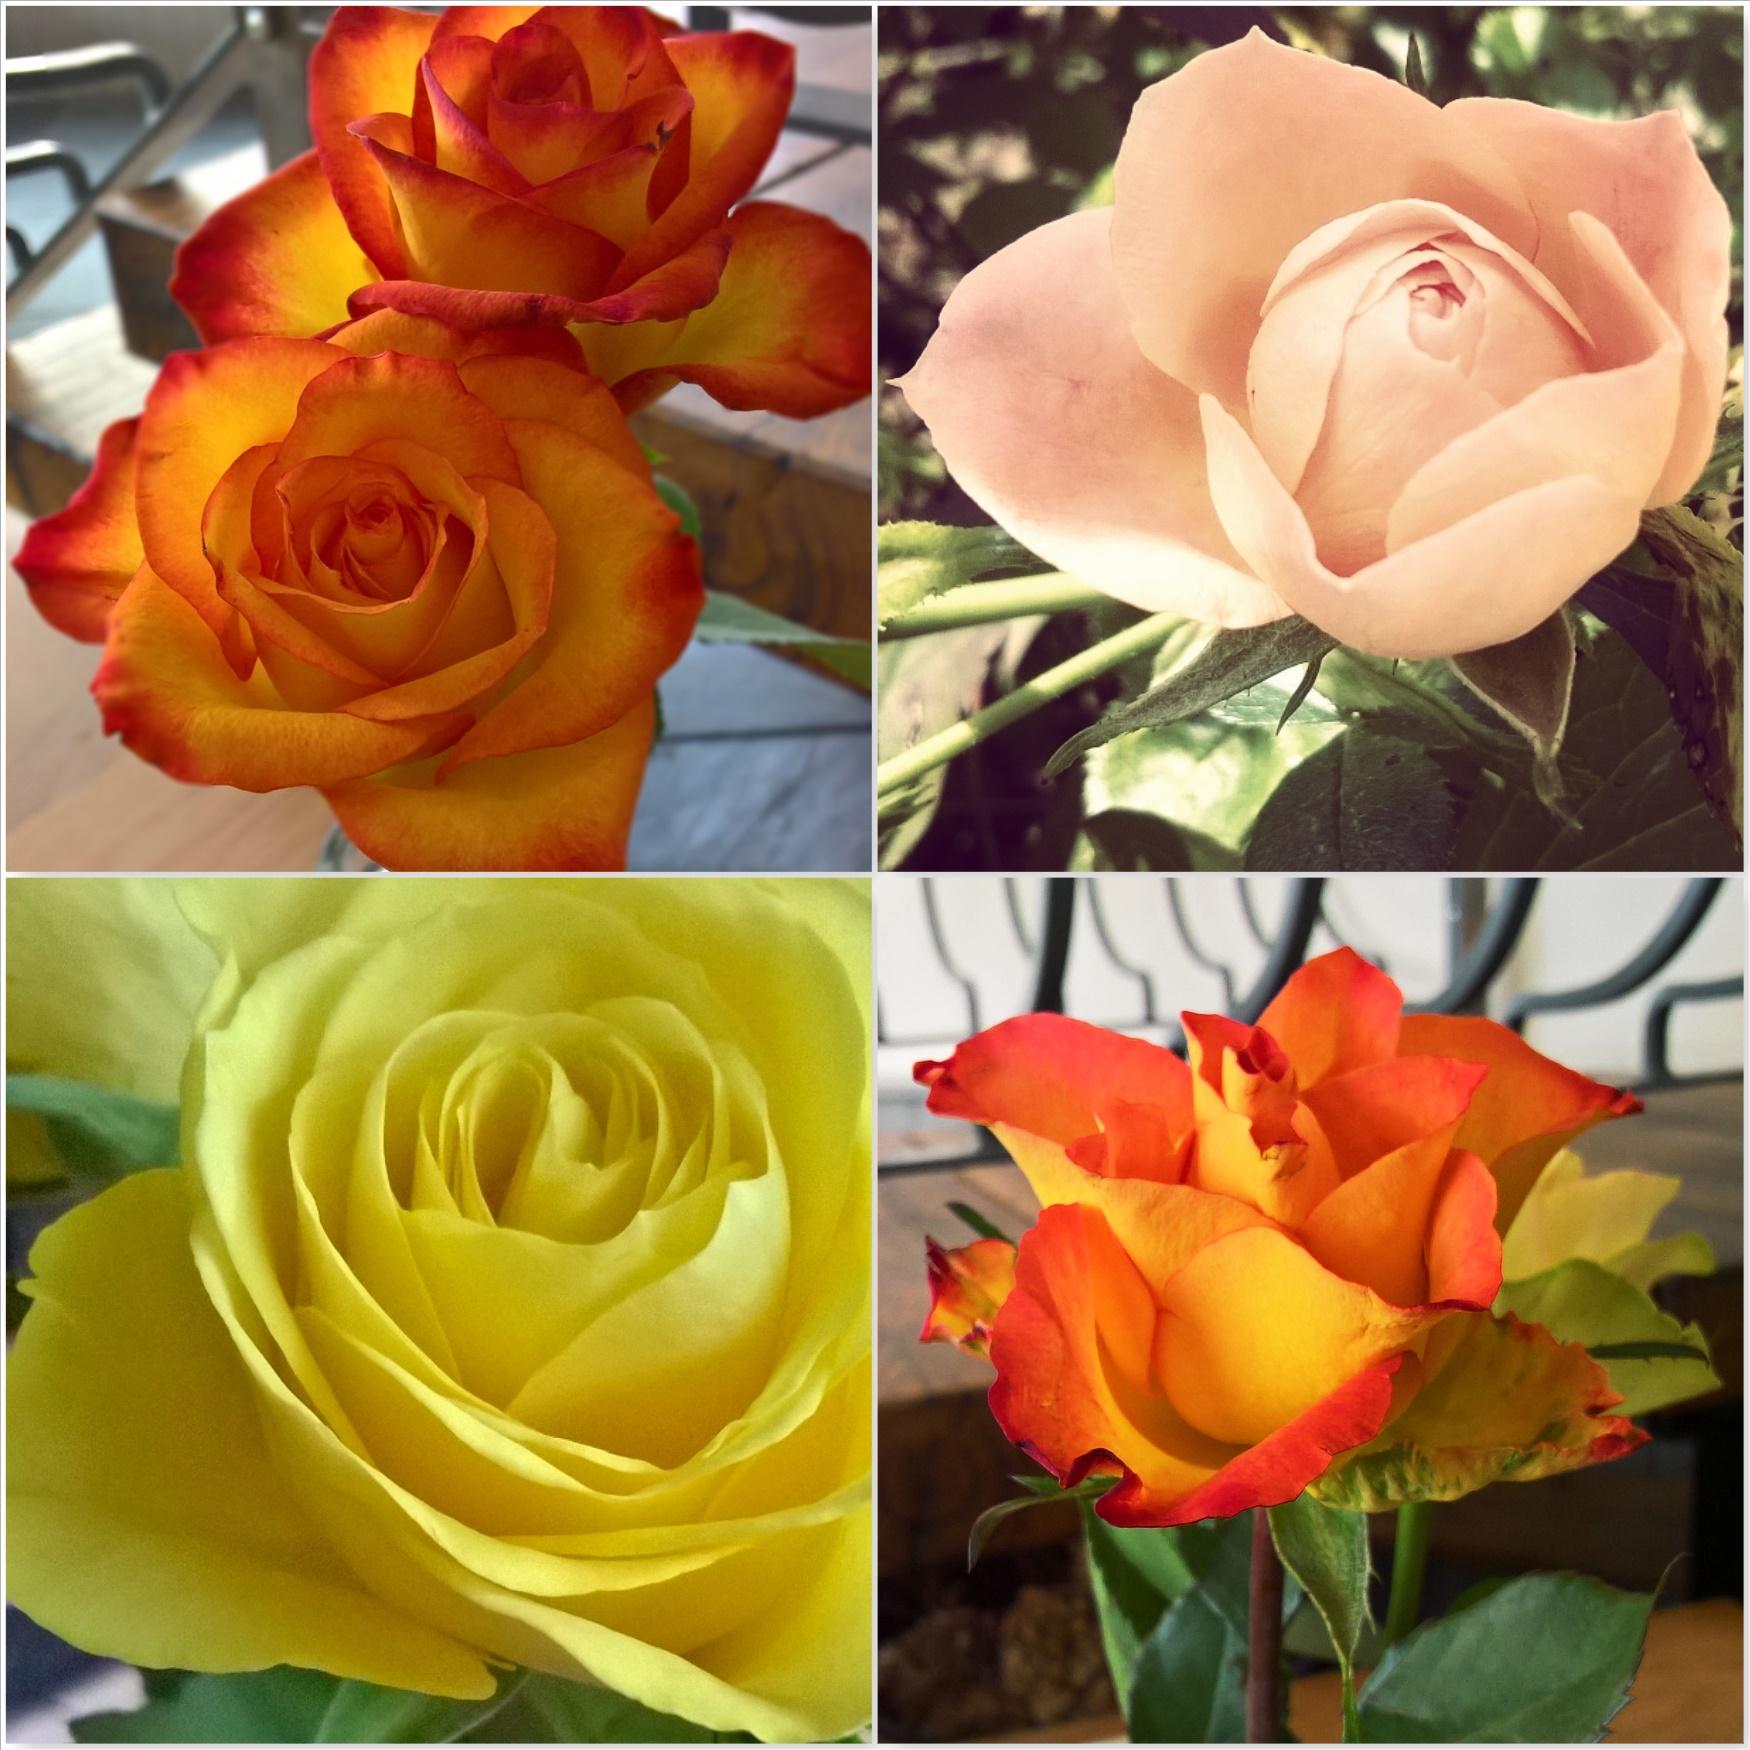 Orange-and-Yellow-Roses-The-Last-Krystallos